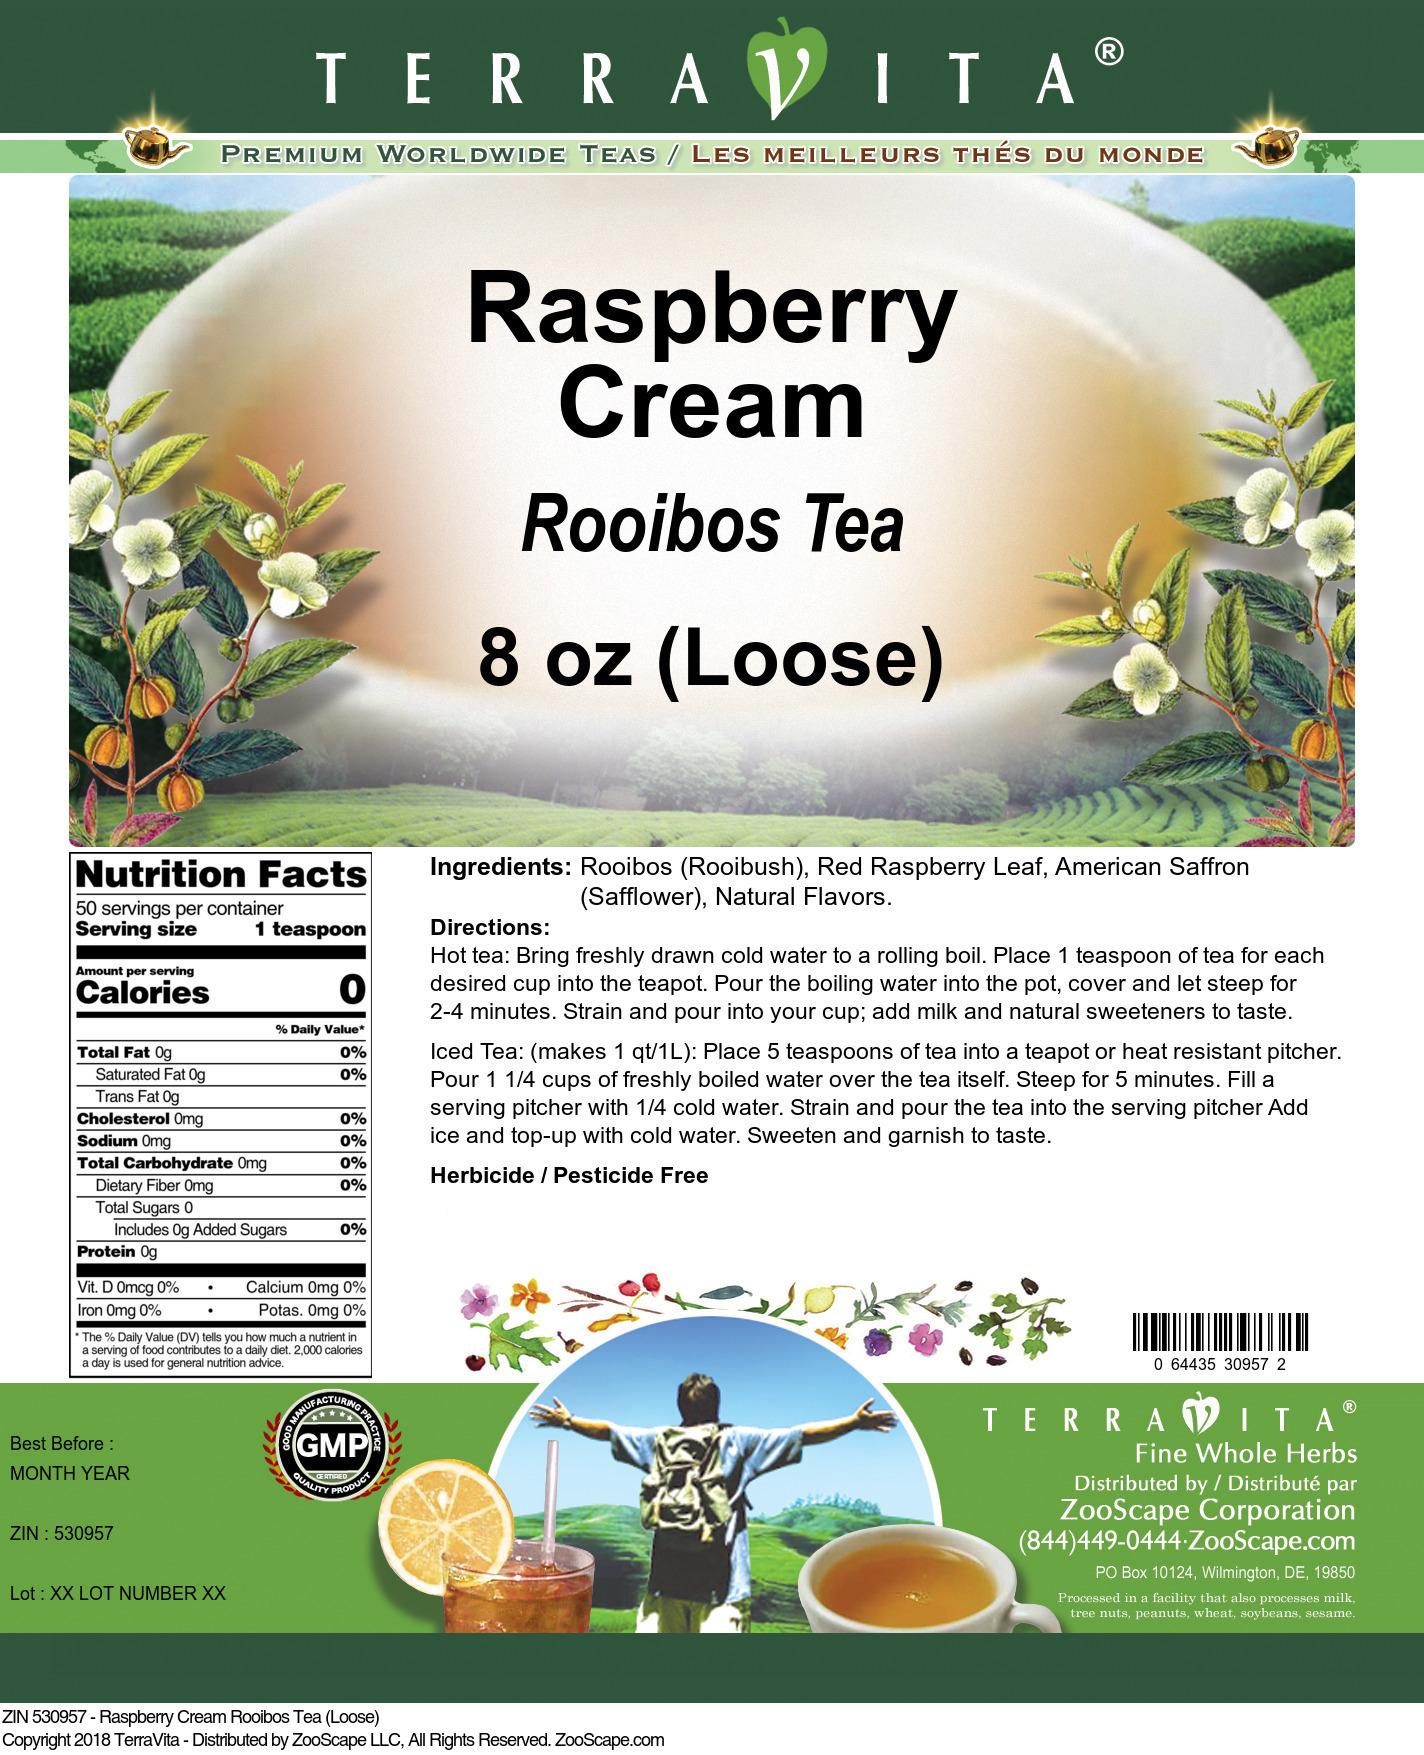 Raspberry Cream Rooibos Tea (Loose)